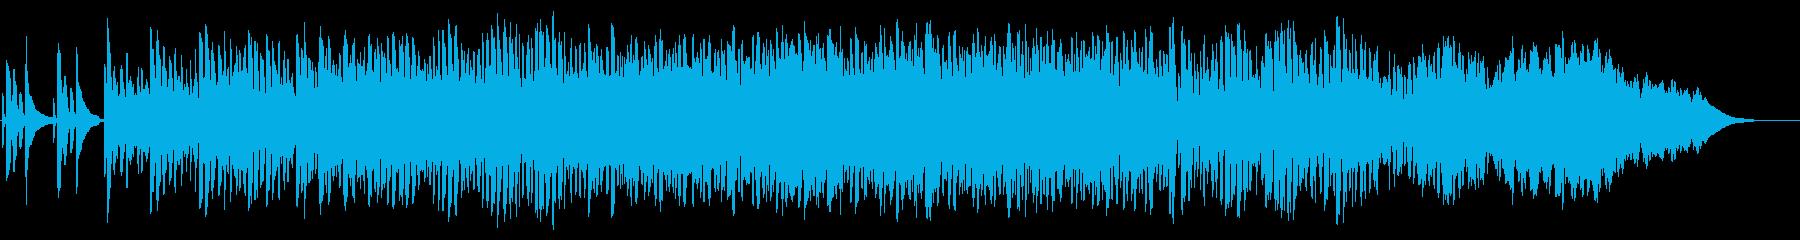 UFO NOMURAの再生済みの波形